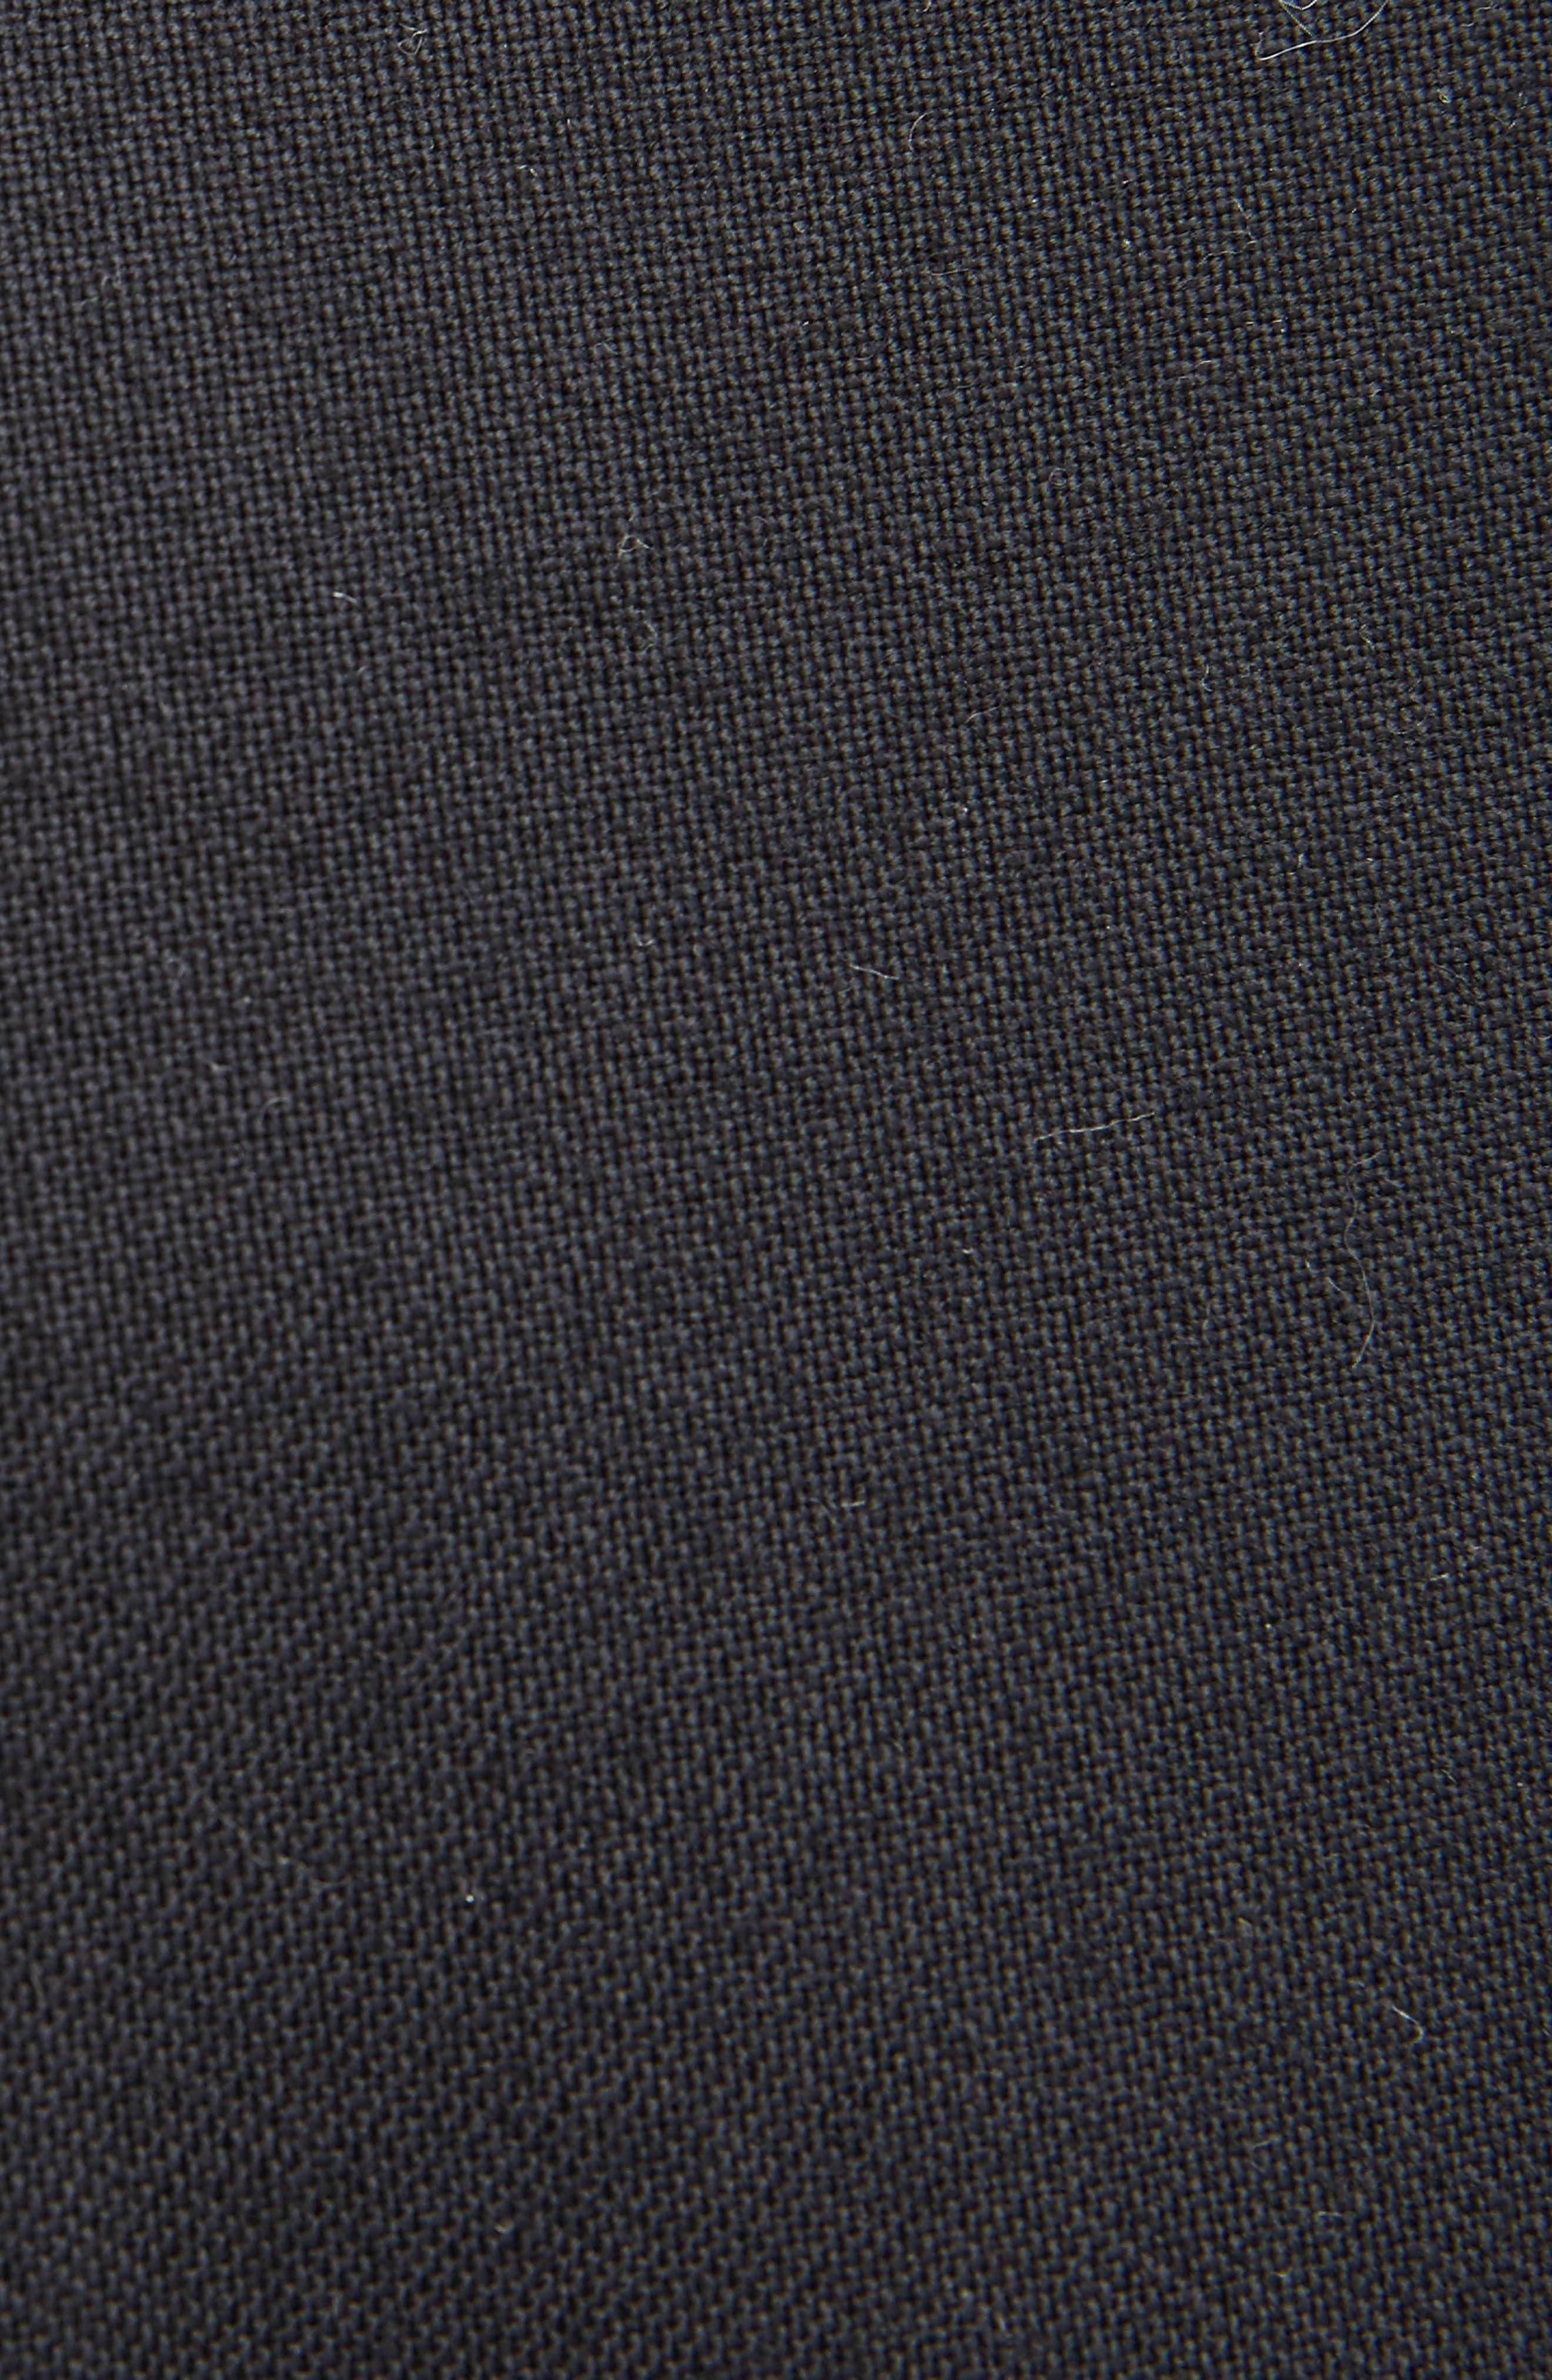 Slit Cuff Crop Flare Pants,                             Alternate thumbnail 5, color,                             001